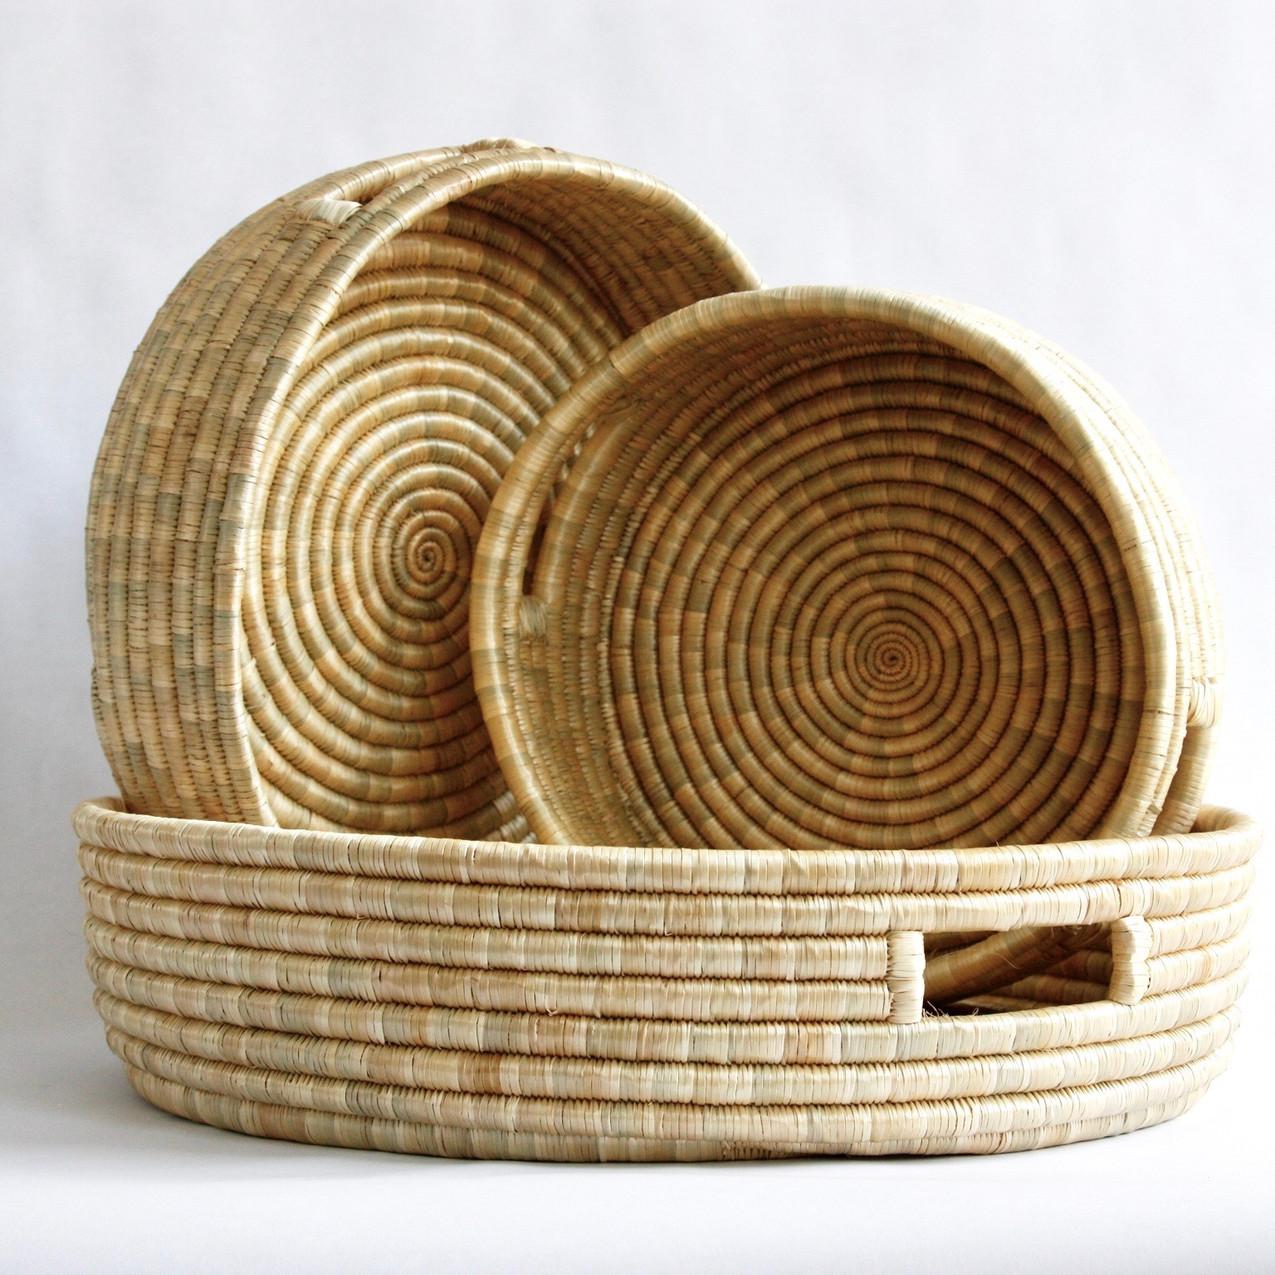 tray-basket-round-hand-woven-natural-gra